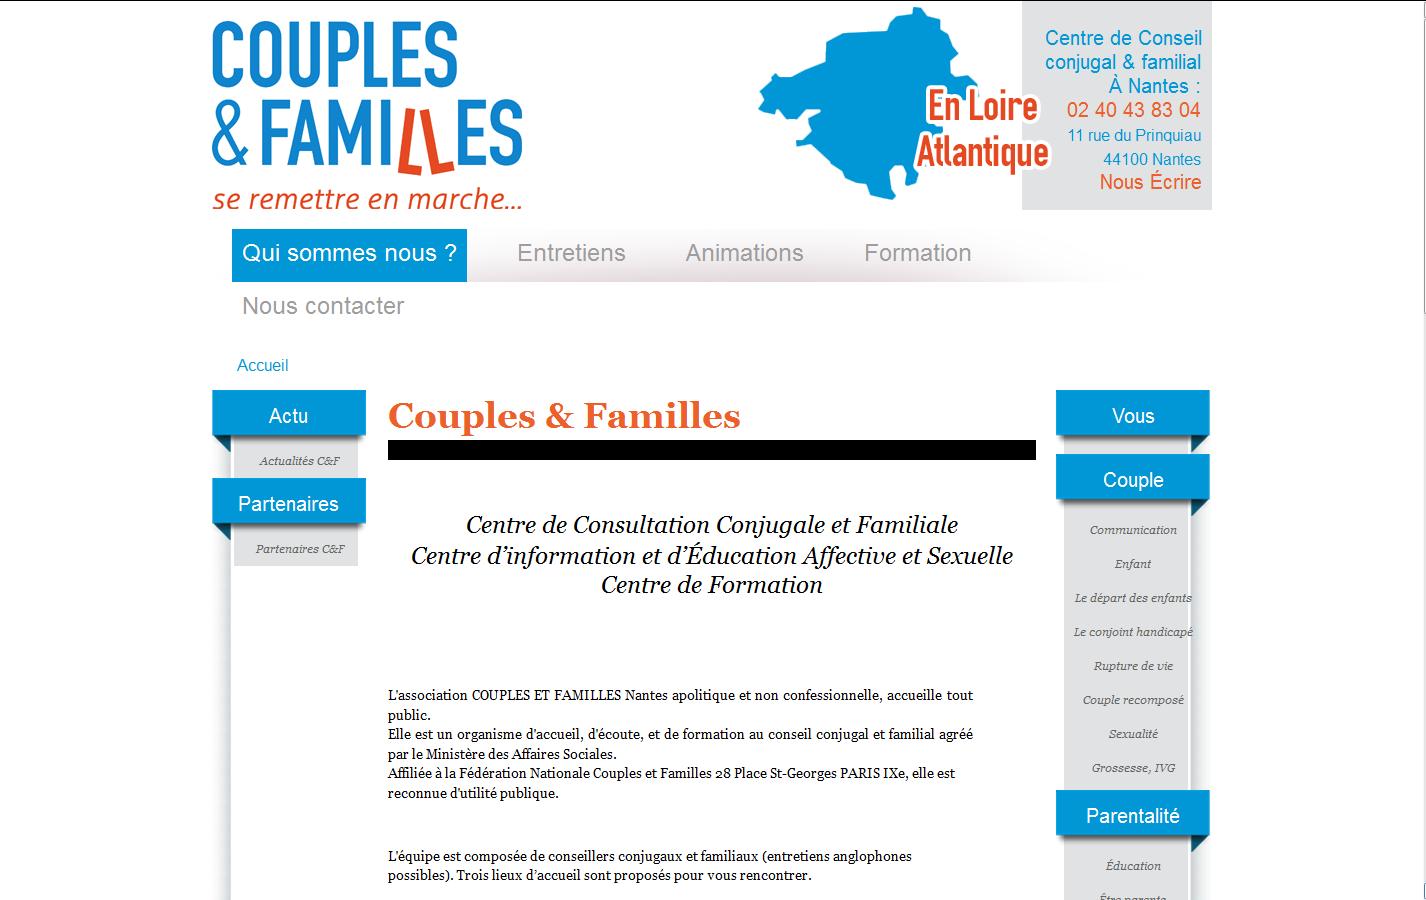 Couples & Familles Nantes